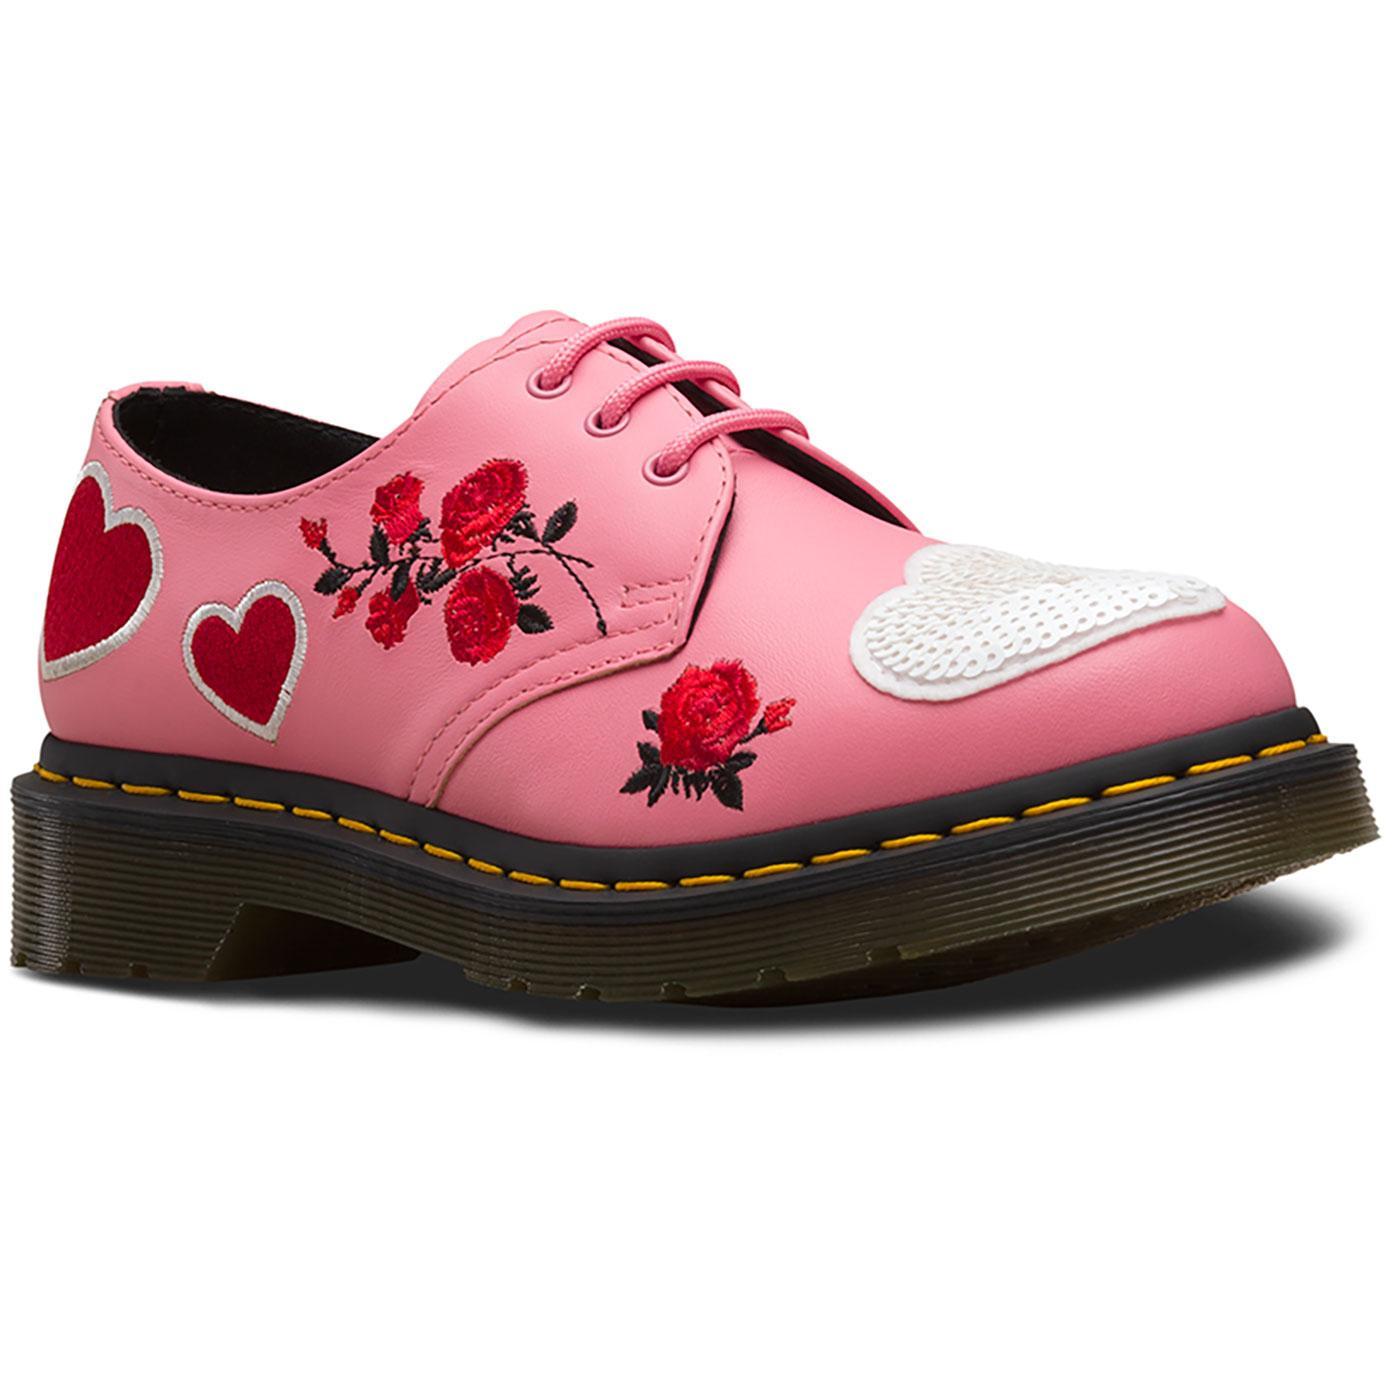 1461 Sequin Hearts DR MARTENS Vintage Heart Shoes